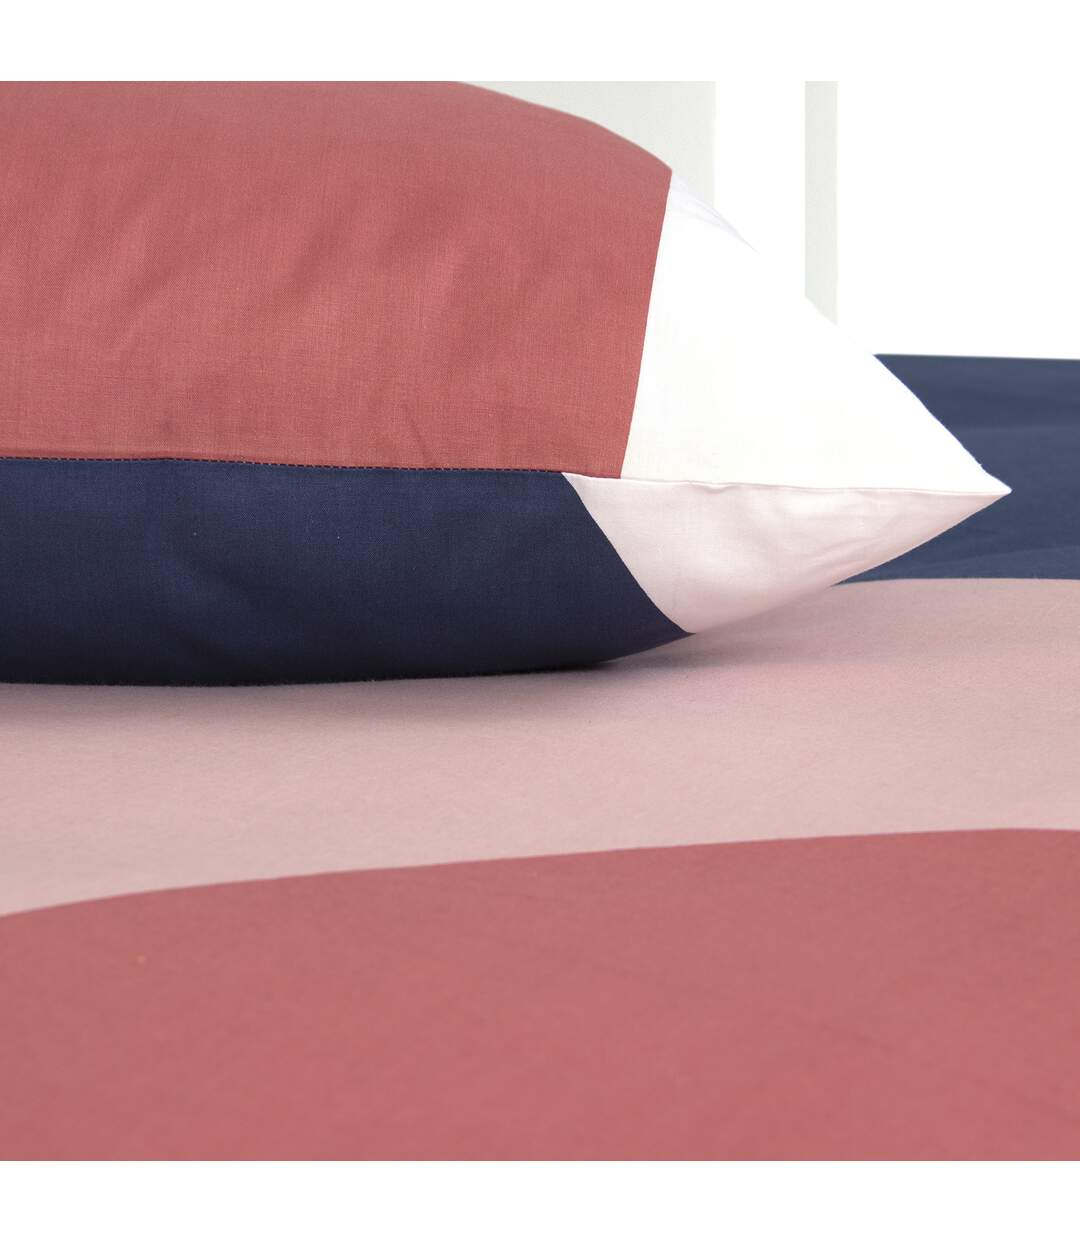 Parure de lit 240x220 cm 100% coton bio ABSTRA Multicolore 3 pièces